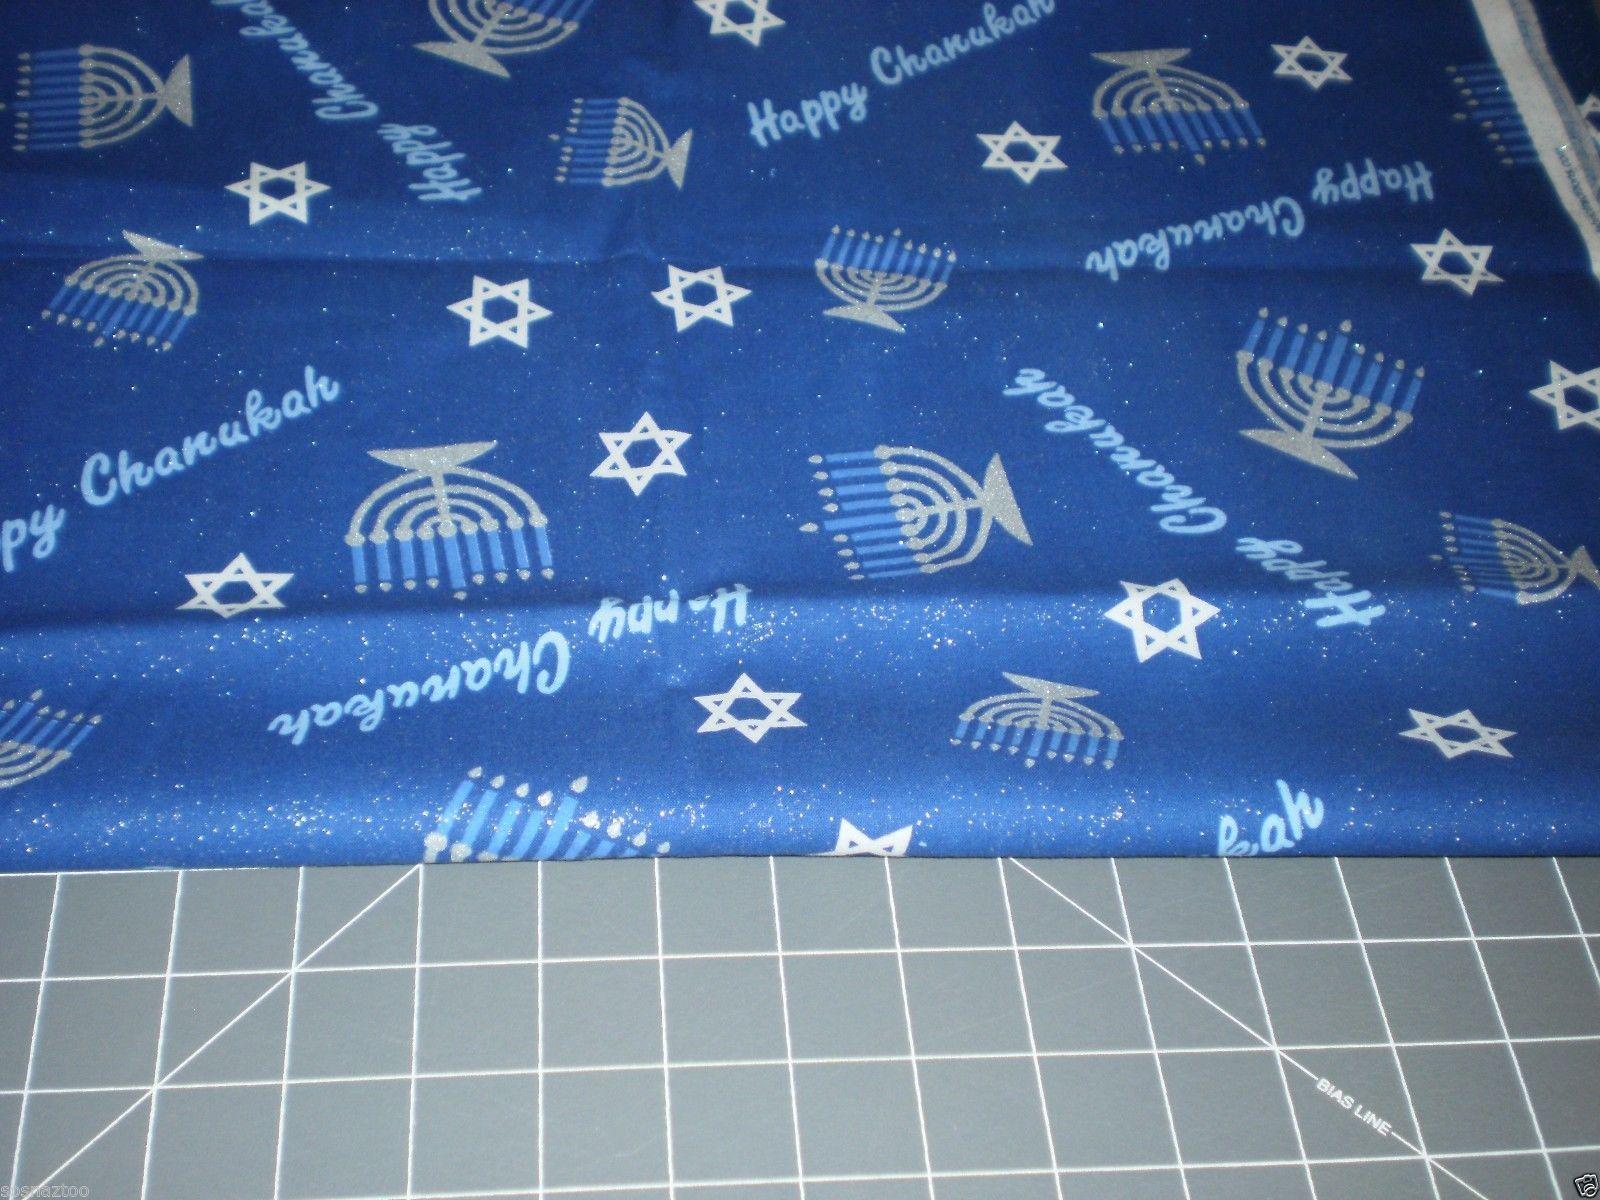 Happy Chanukah Silver Metallic Glitter Star of David Menorah Fabric Traditions